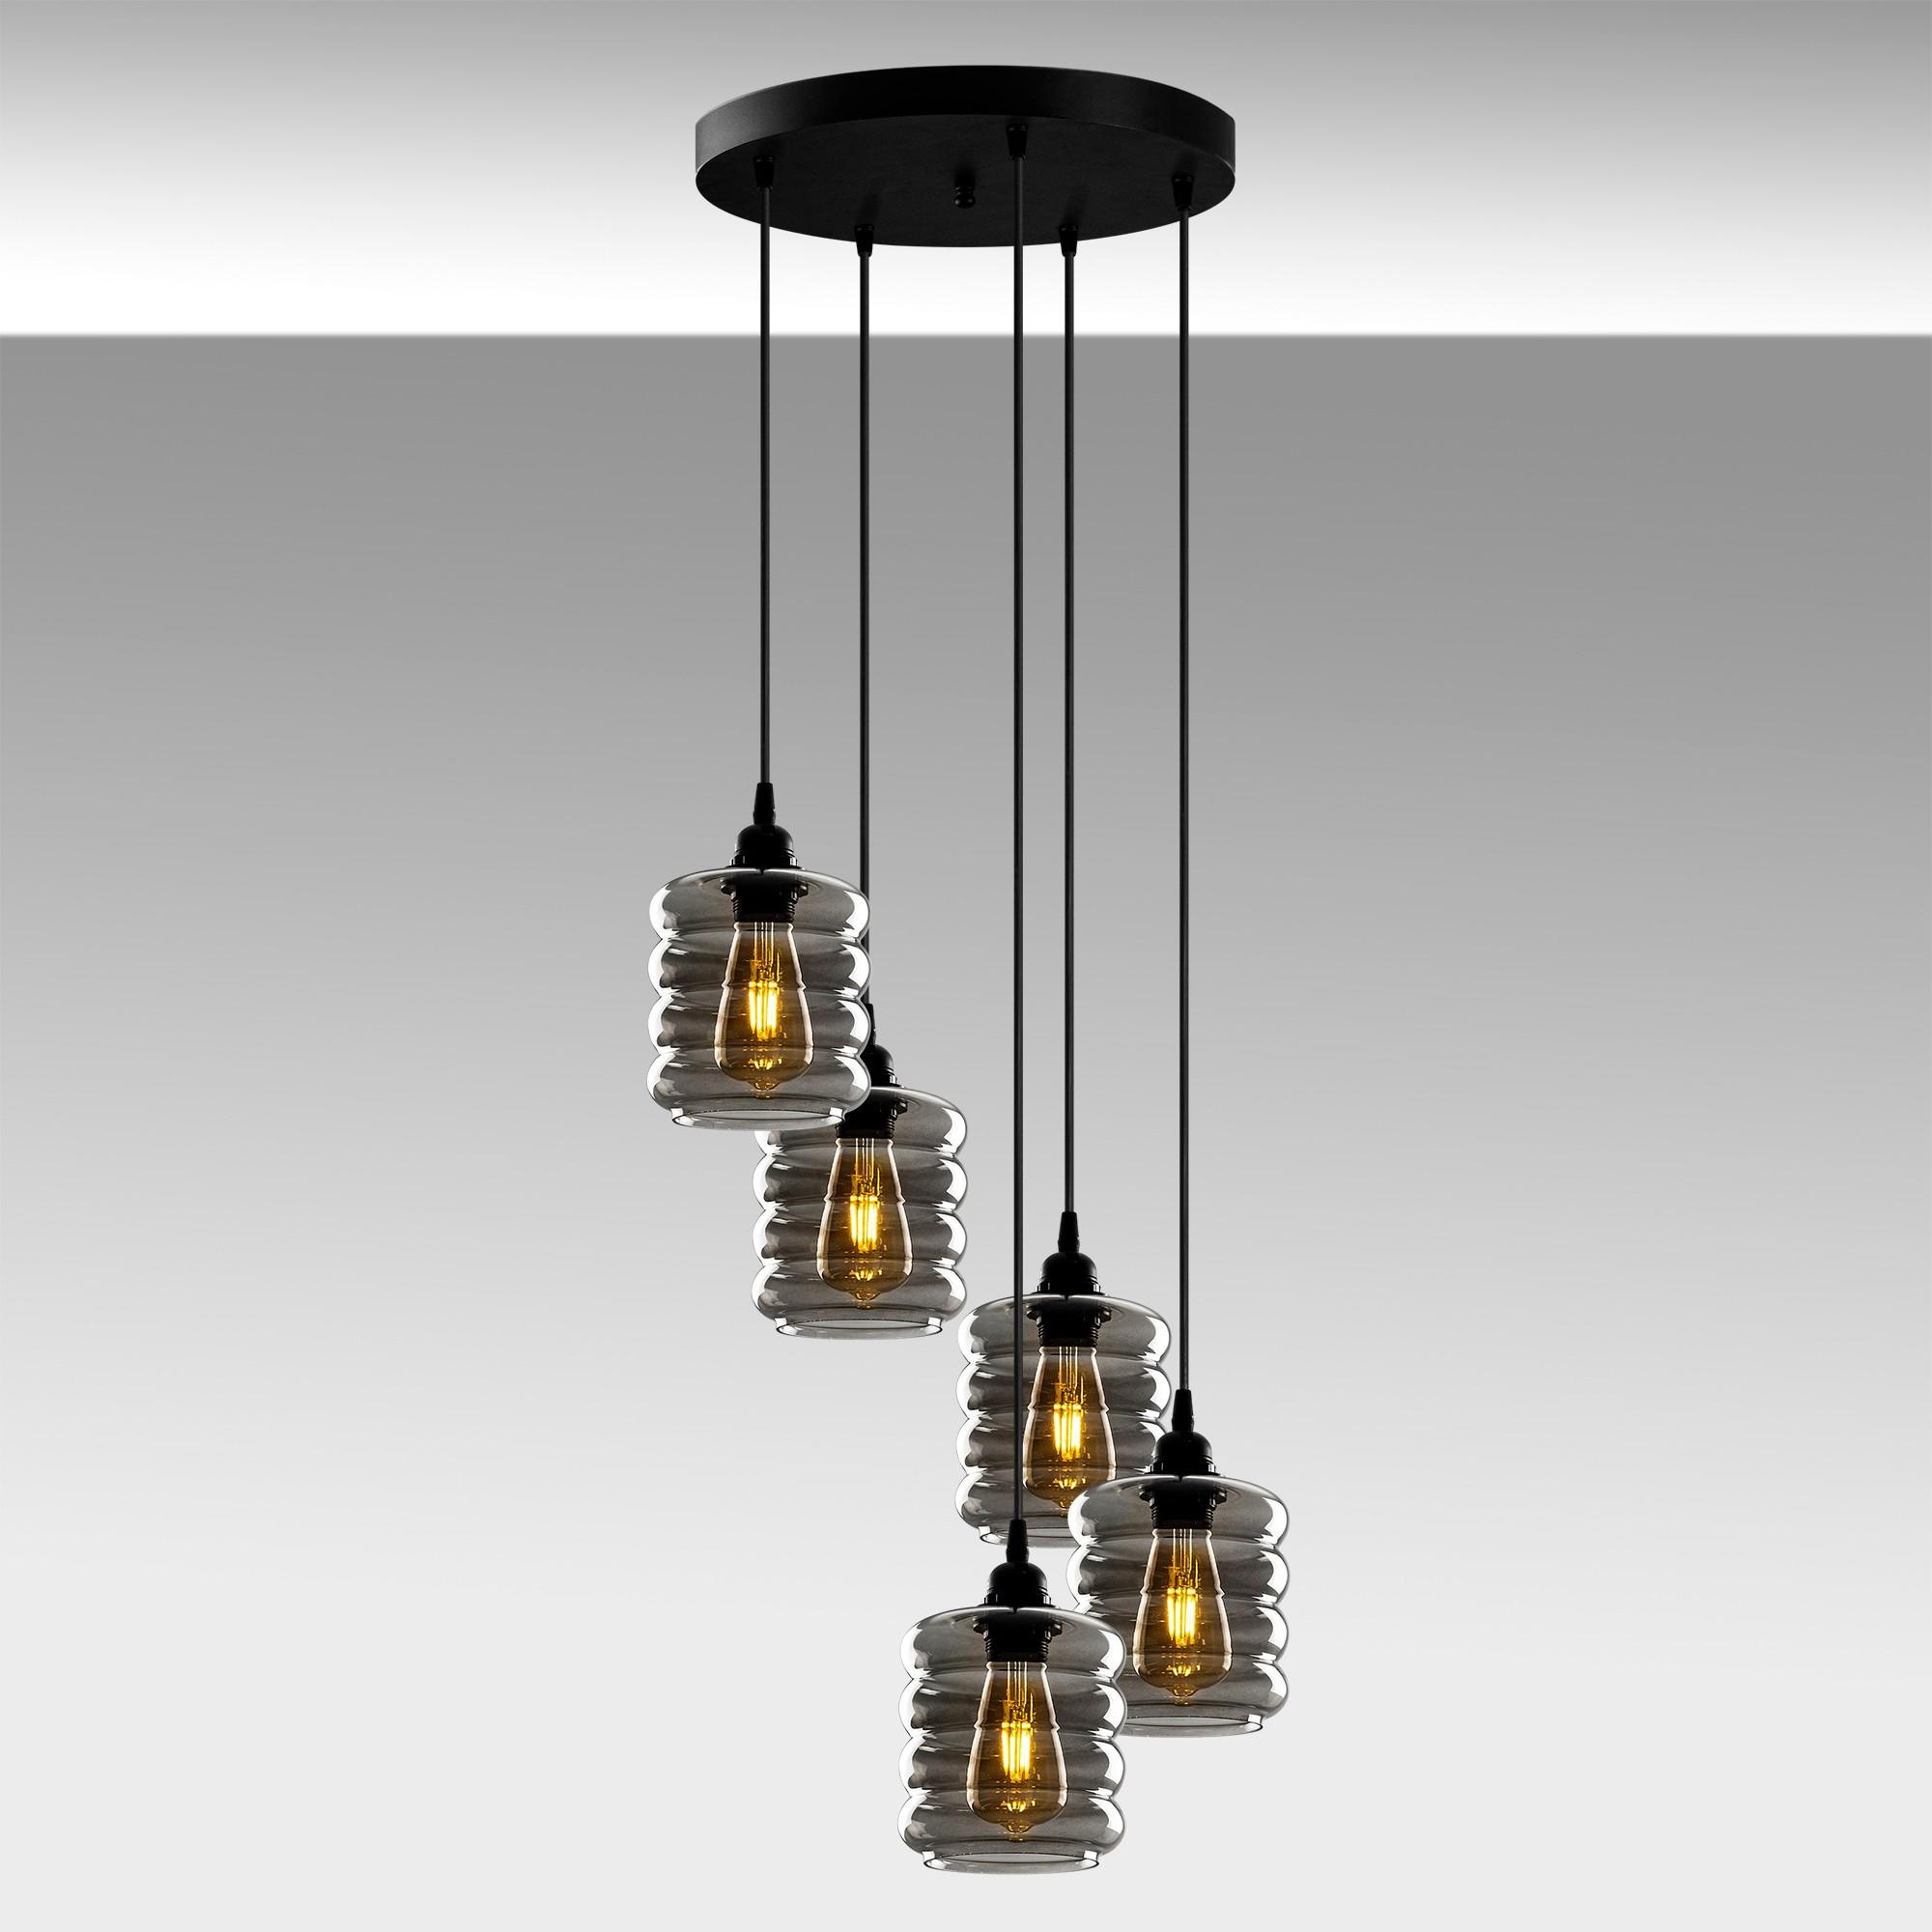 Hanglamp gerookt glas 5 keer E27 fitting - sfeerfoto